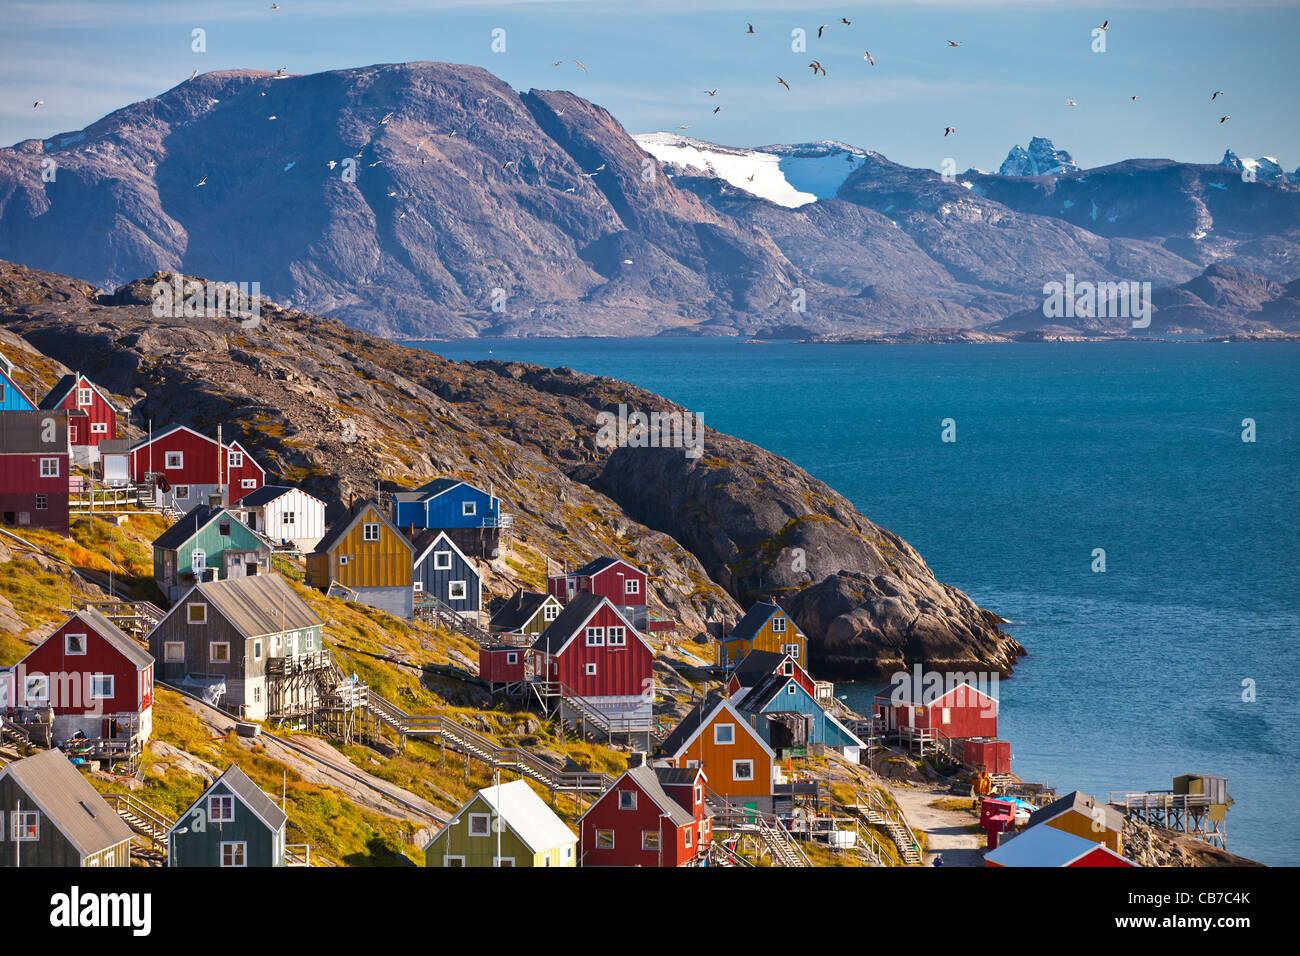 Inuit village of Kangaamiut, western Greenland - Stock Image